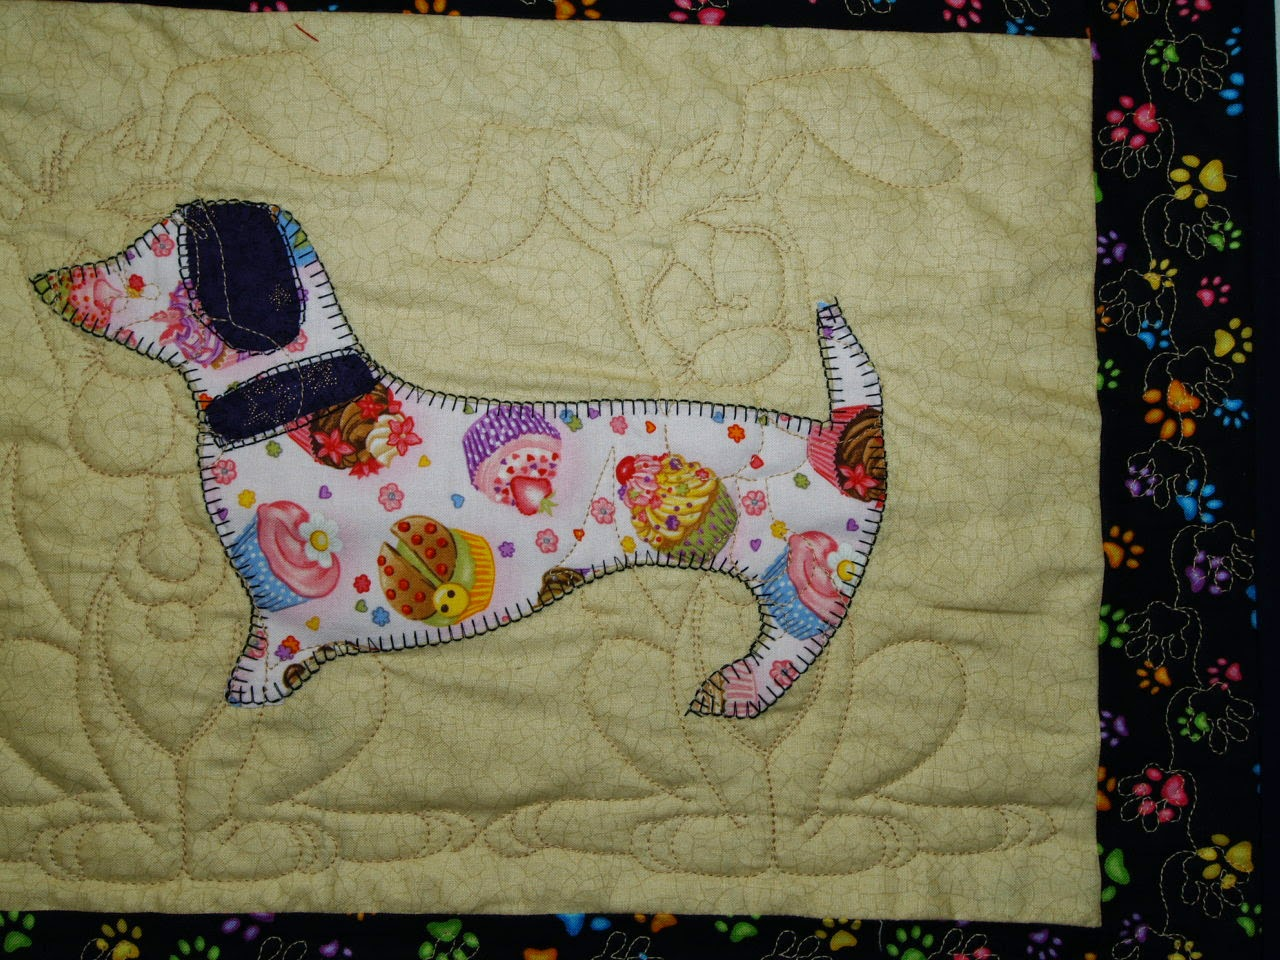 Jessica Hudon's Doggie Quilt